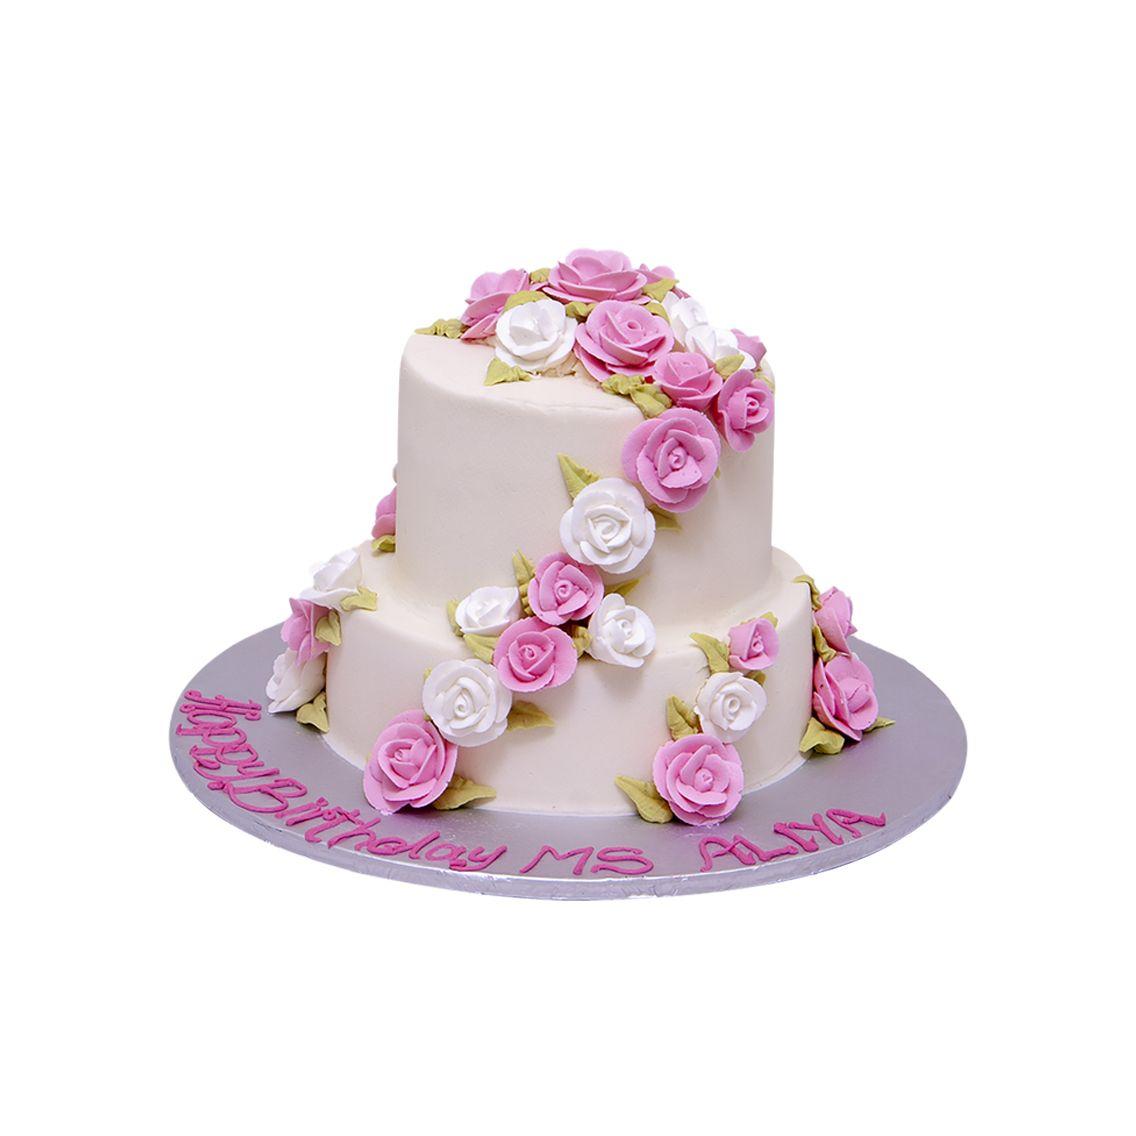 Kitchen Cuisine Default Category Pink & White Flower Cake